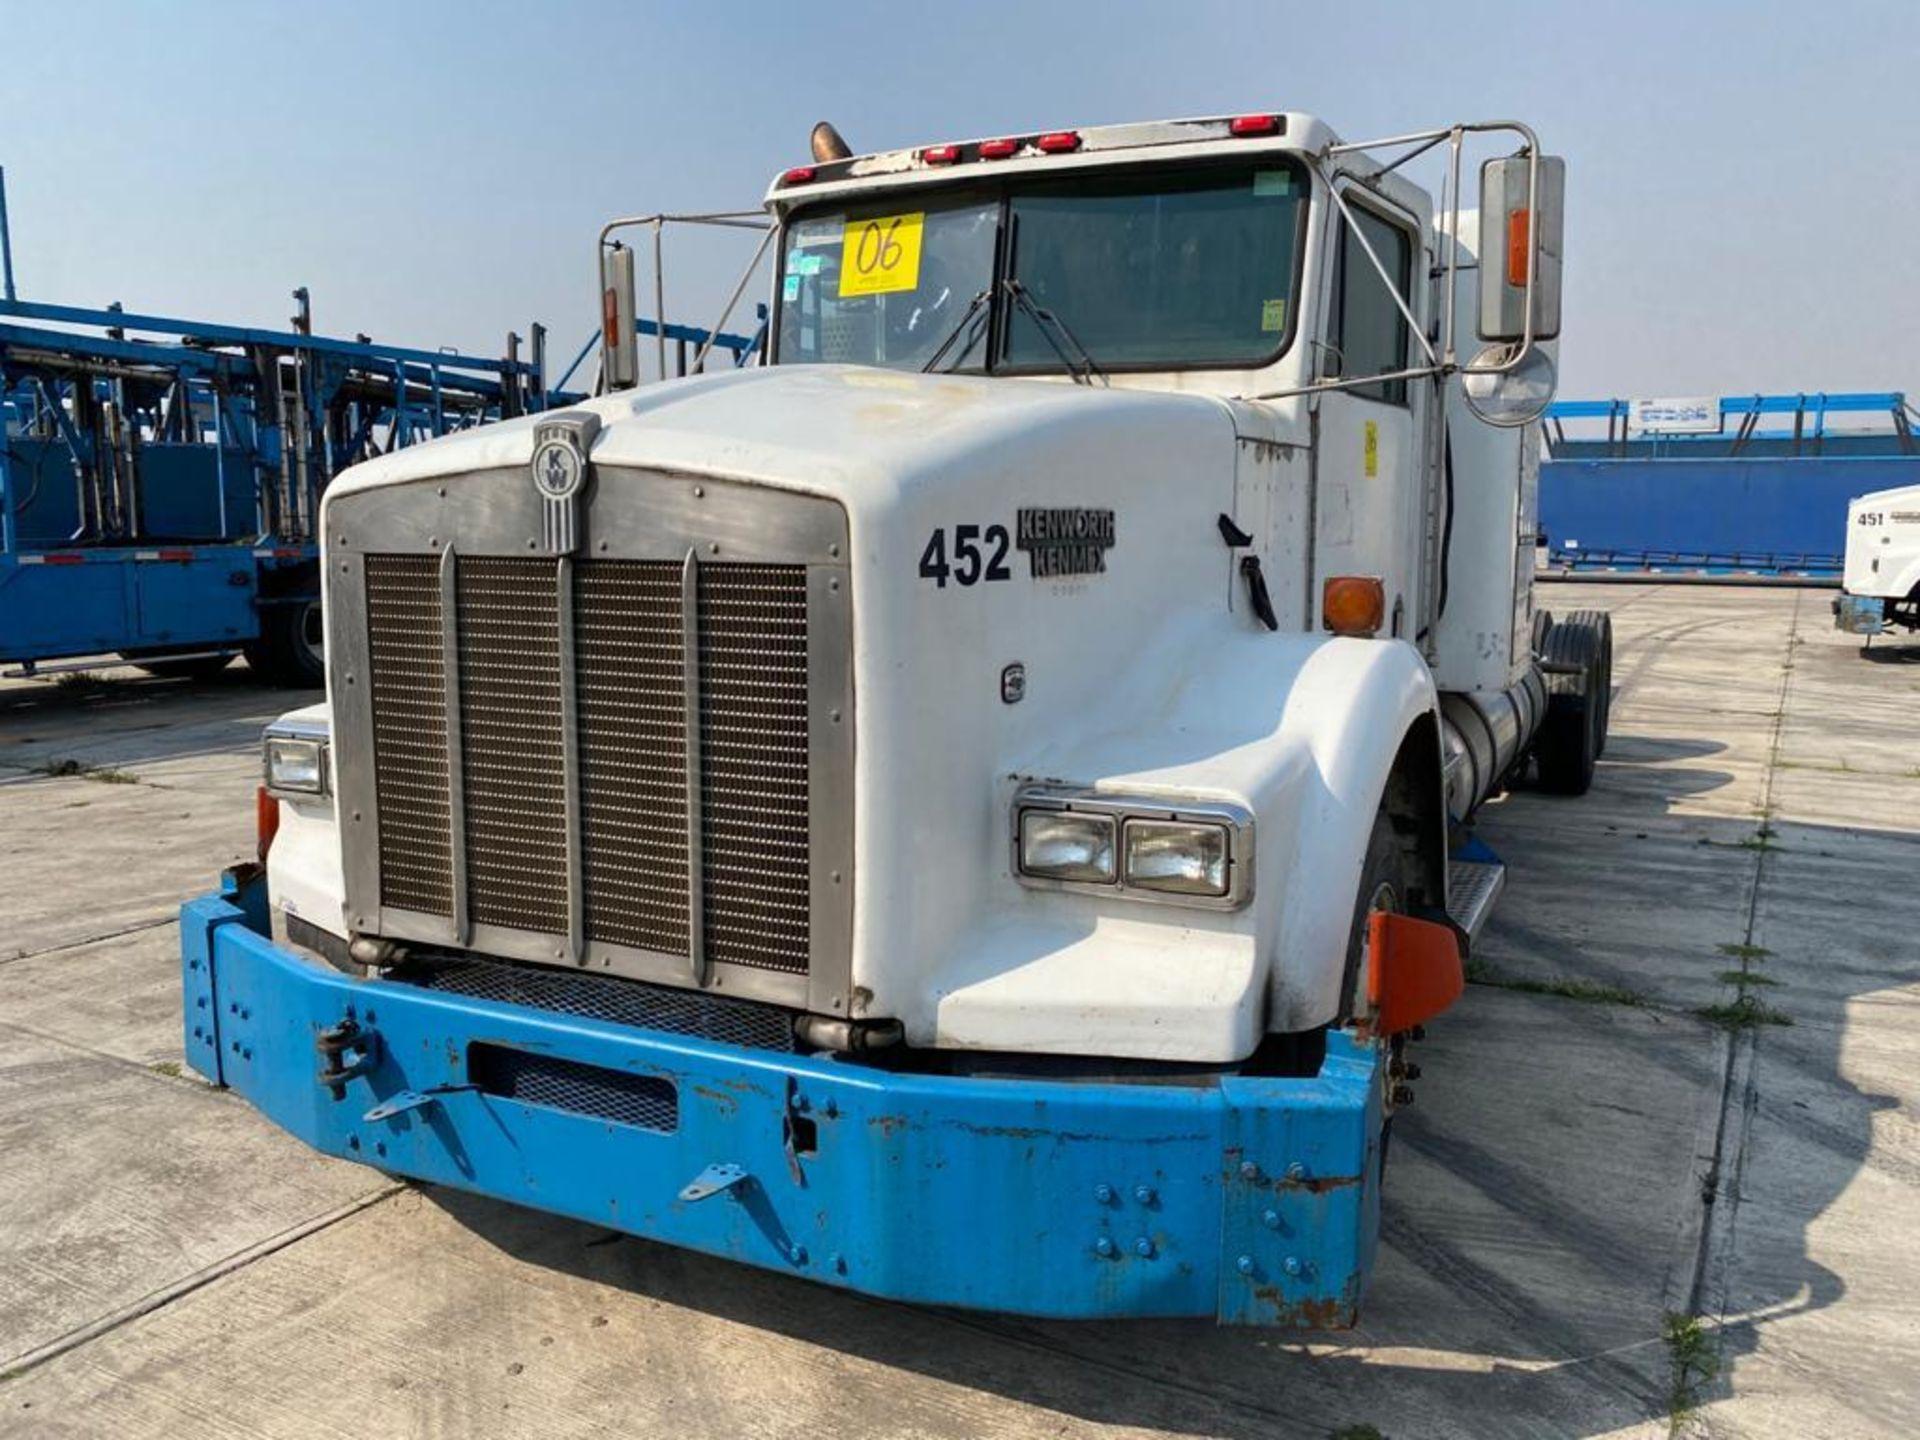 1998 Kenworth Sleeper truck tractor, standard transmission of 18 speeds - Image 5 of 75